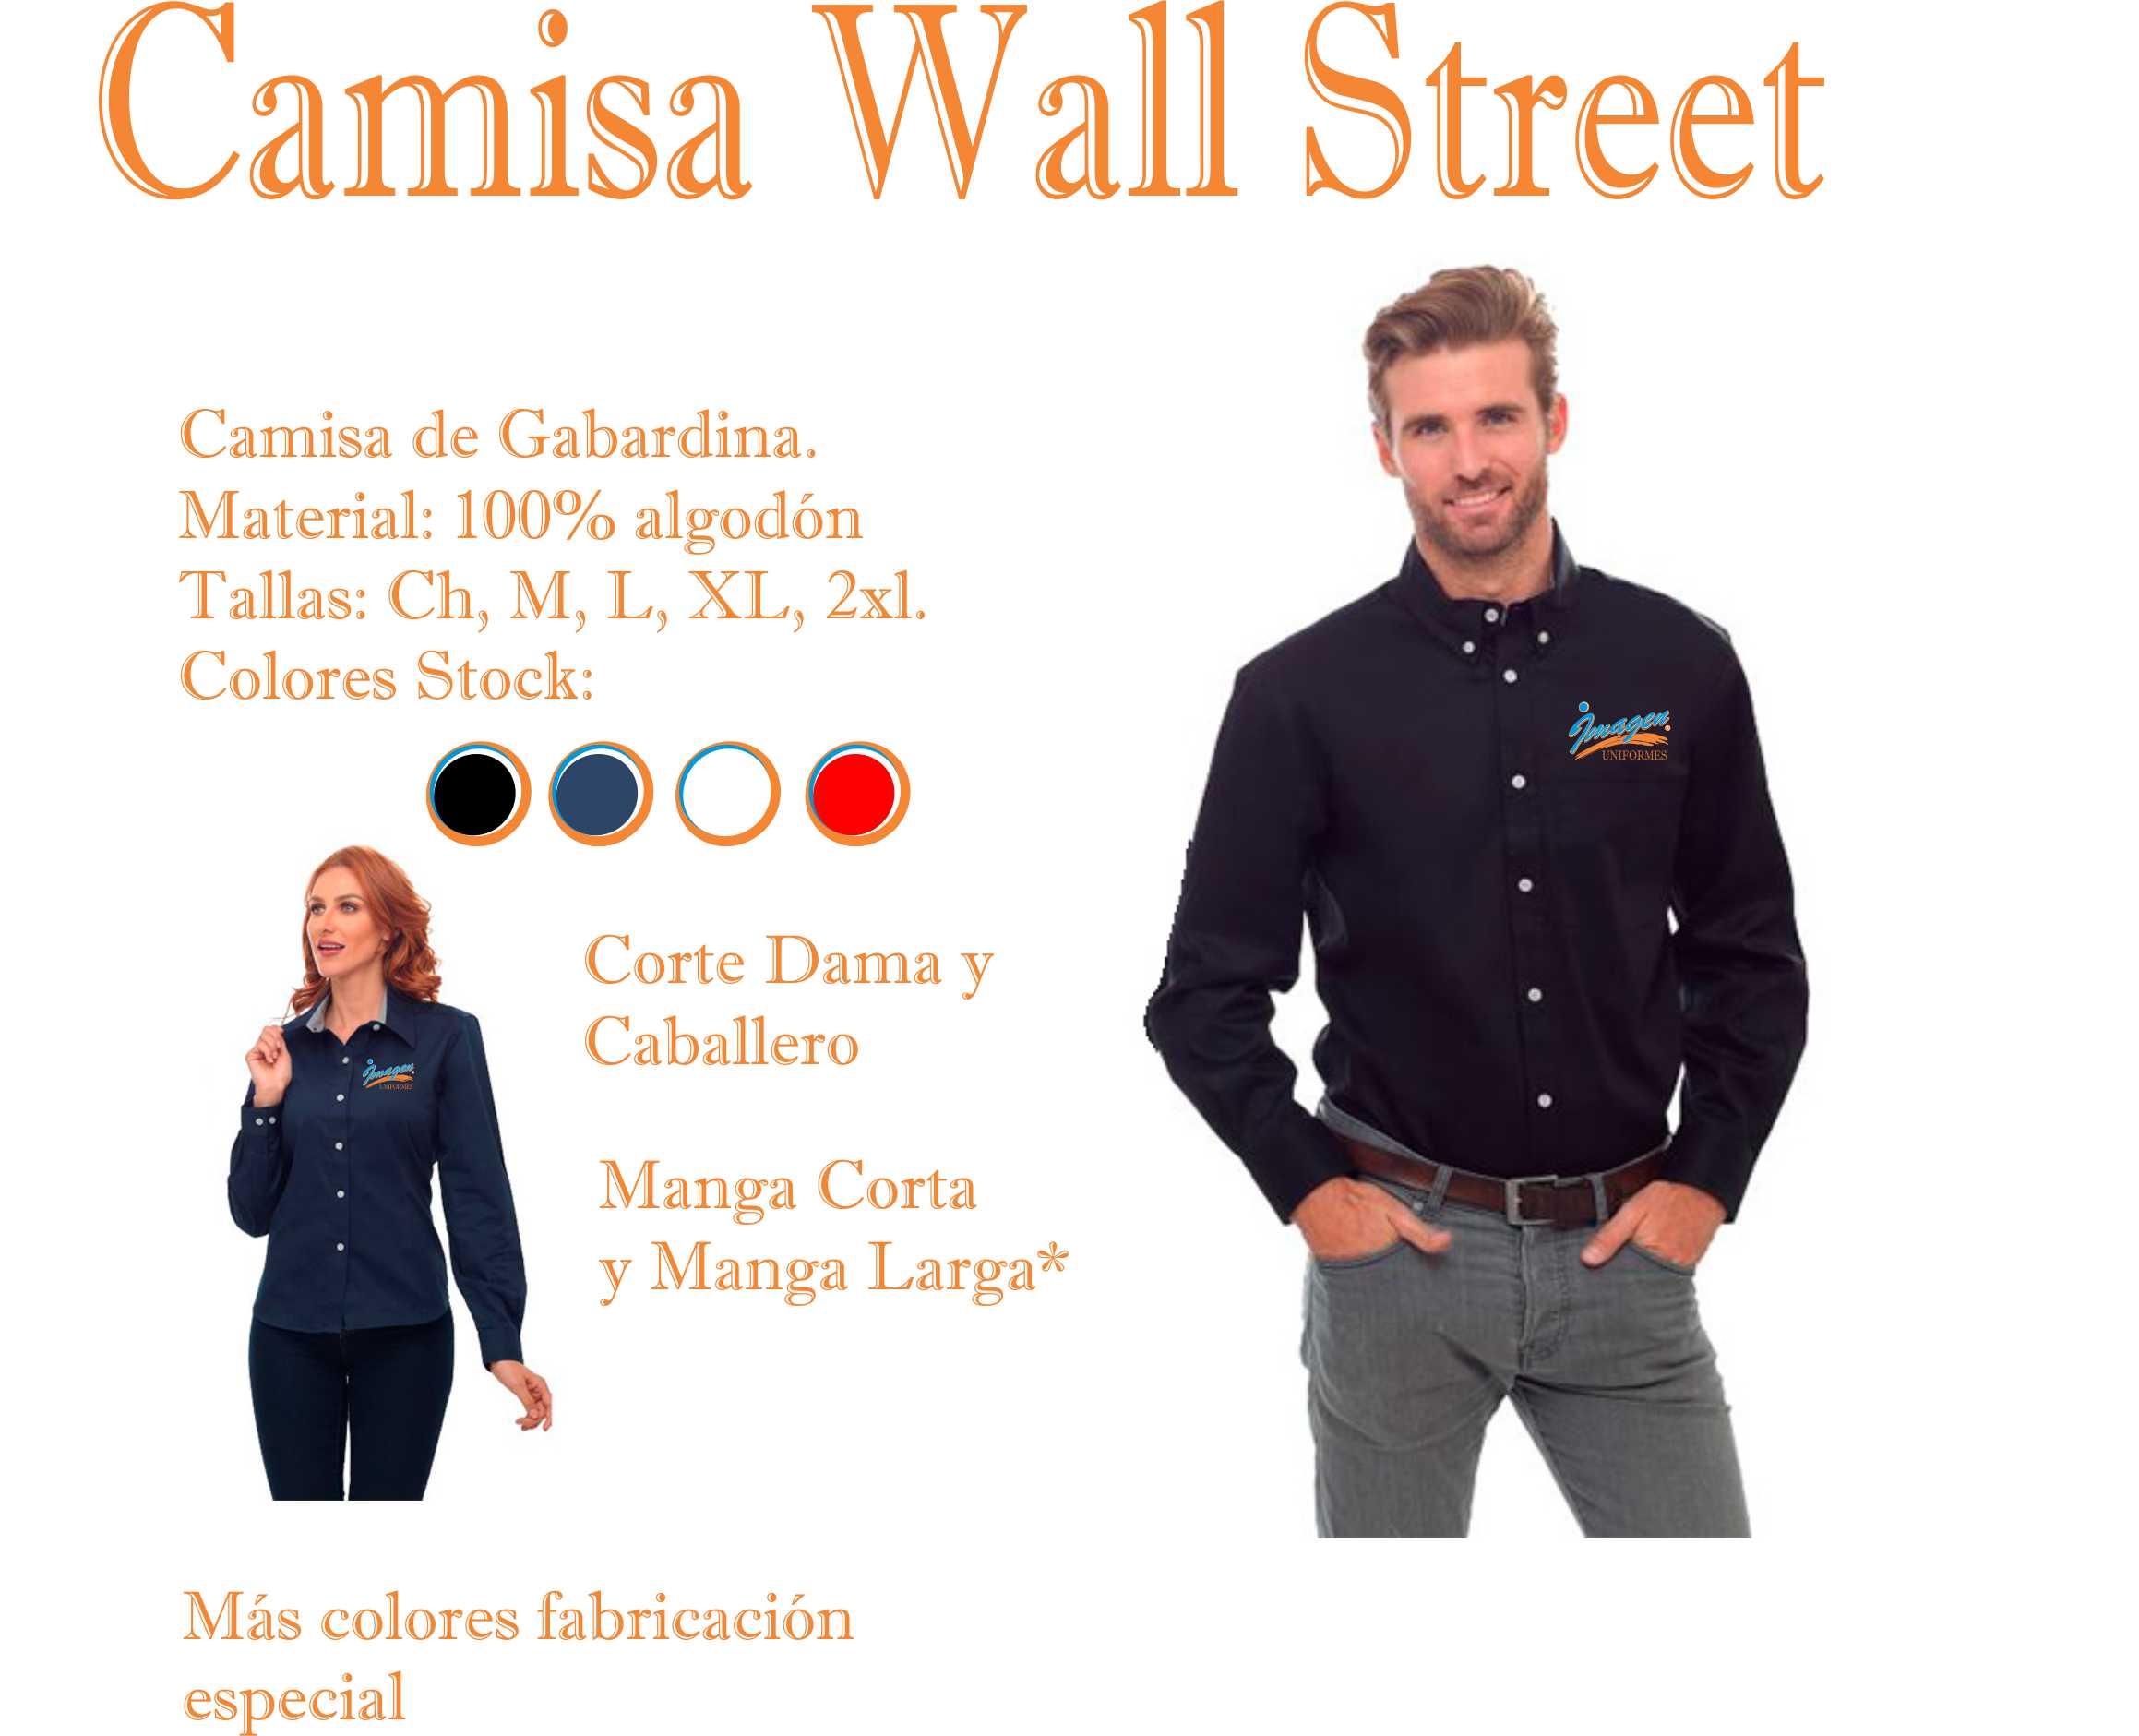 Camisa Wall Street